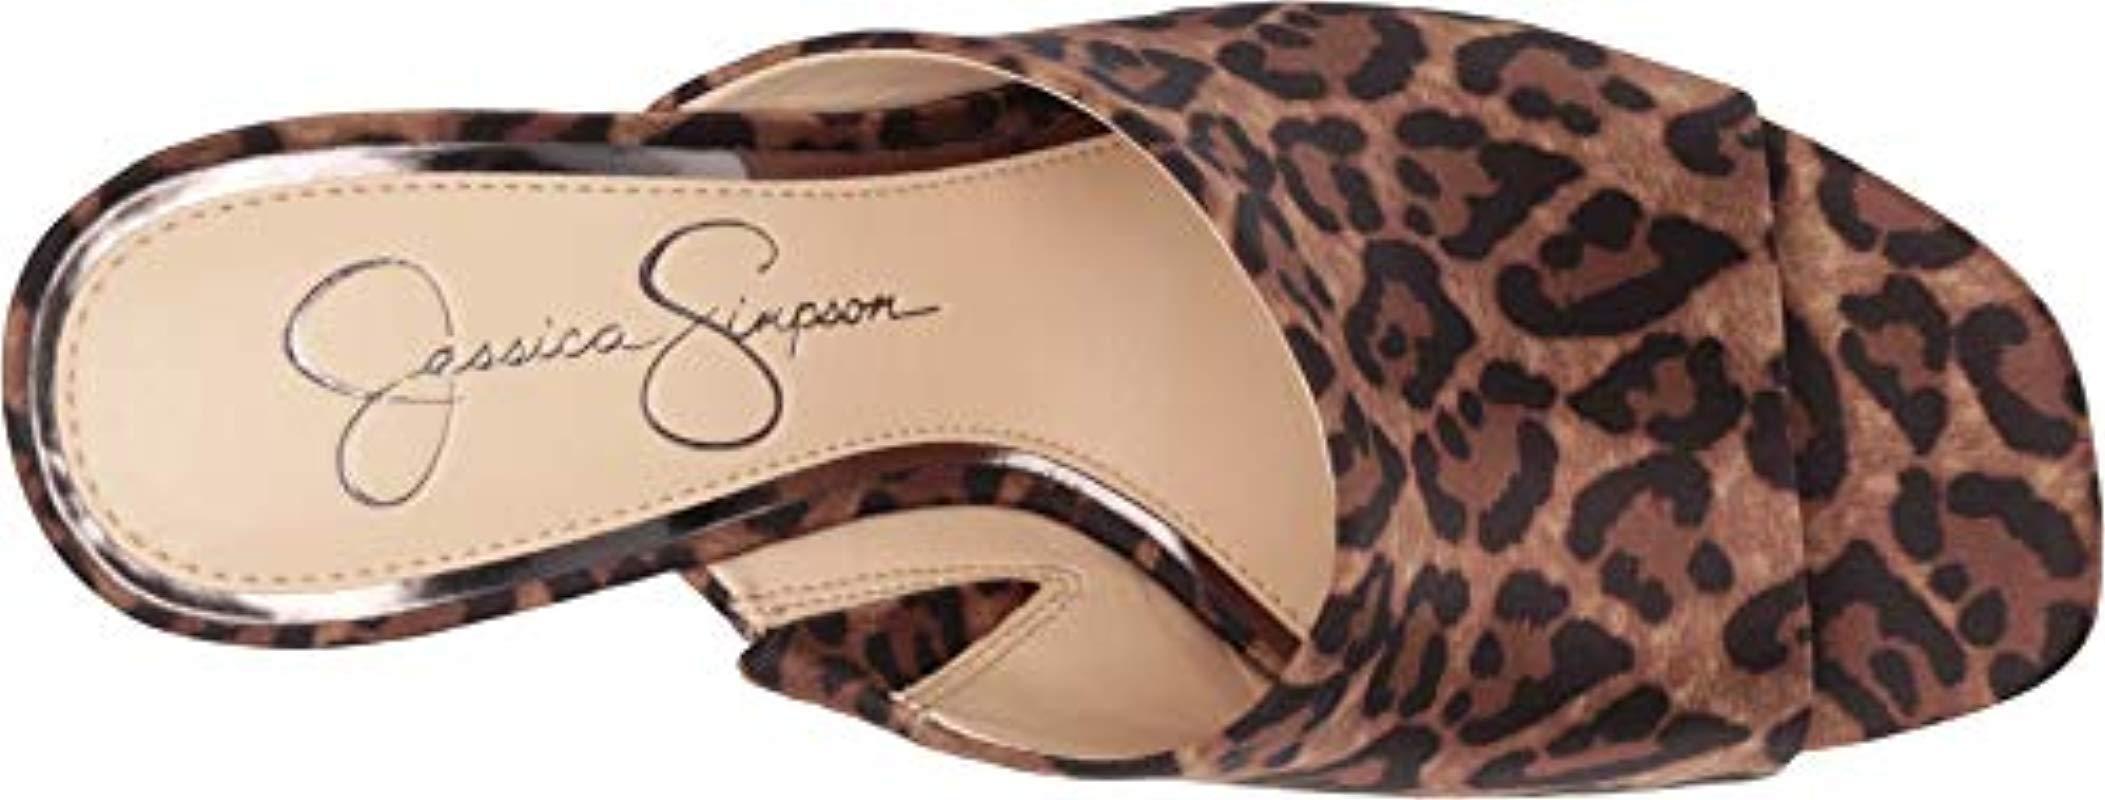 45238abf0eb Jessica Simpson - Brown Shantelle - Lyst. View fullscreen